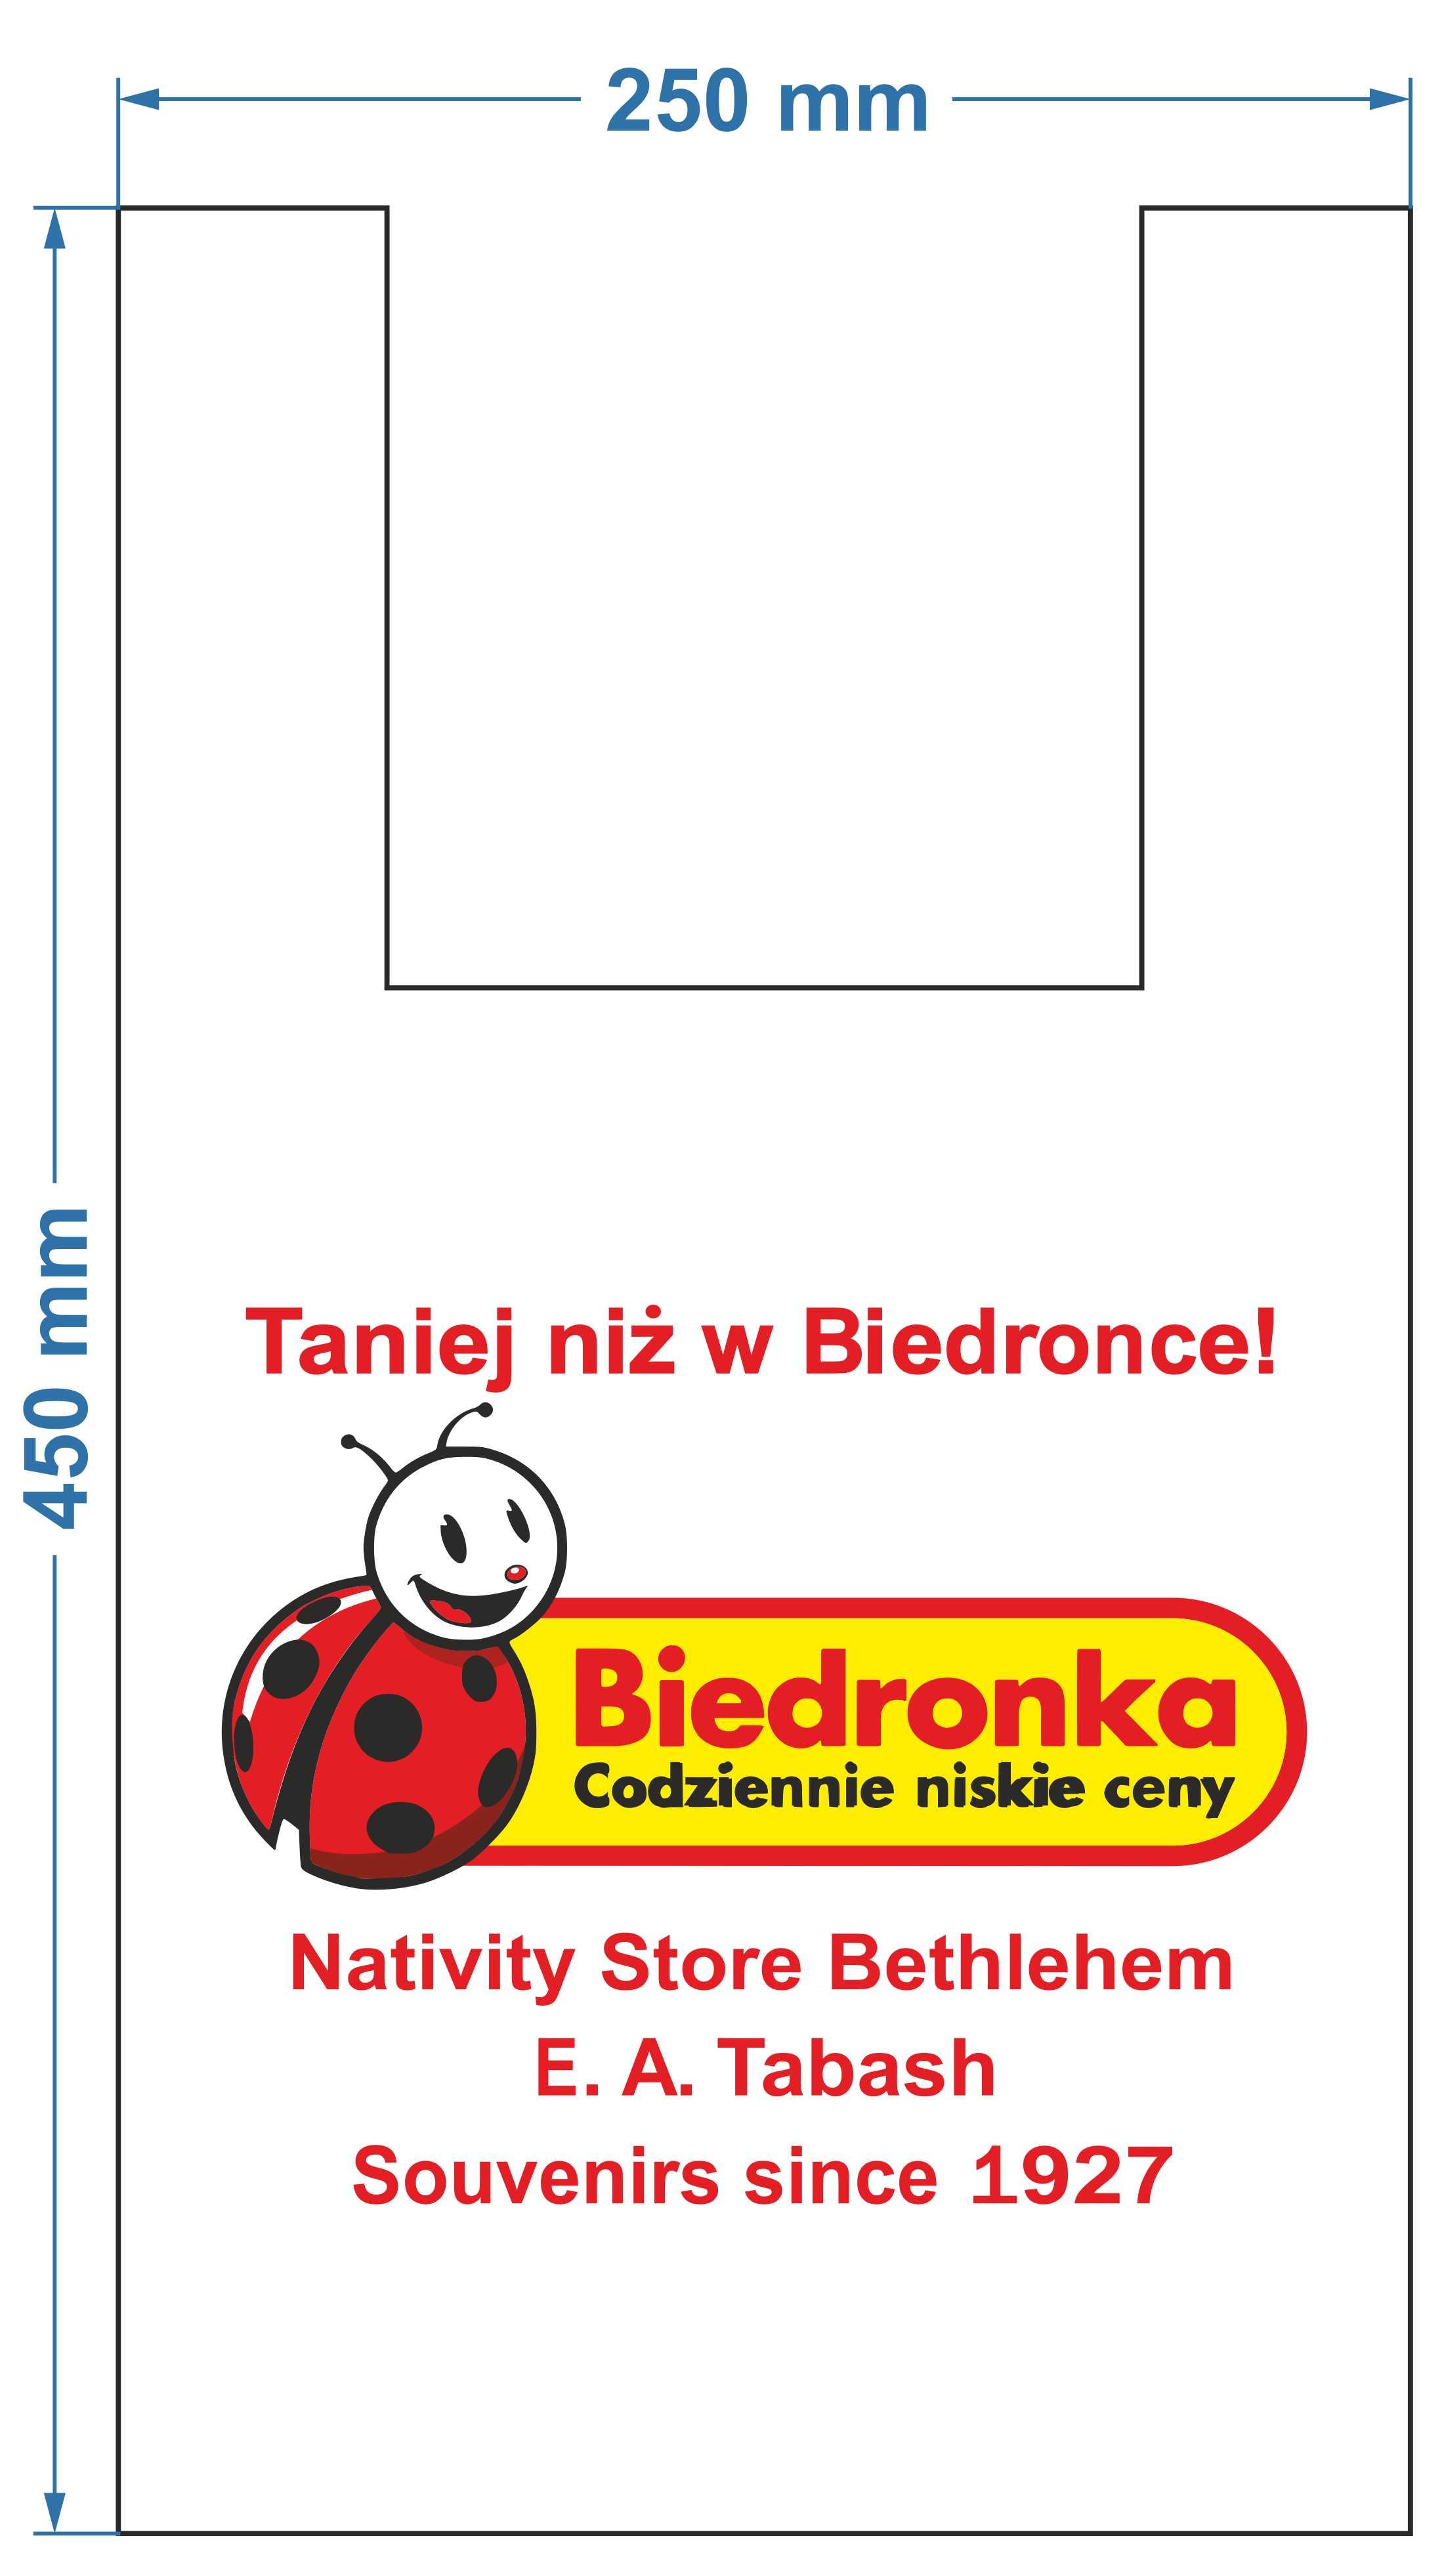 reklamówki_biedronka